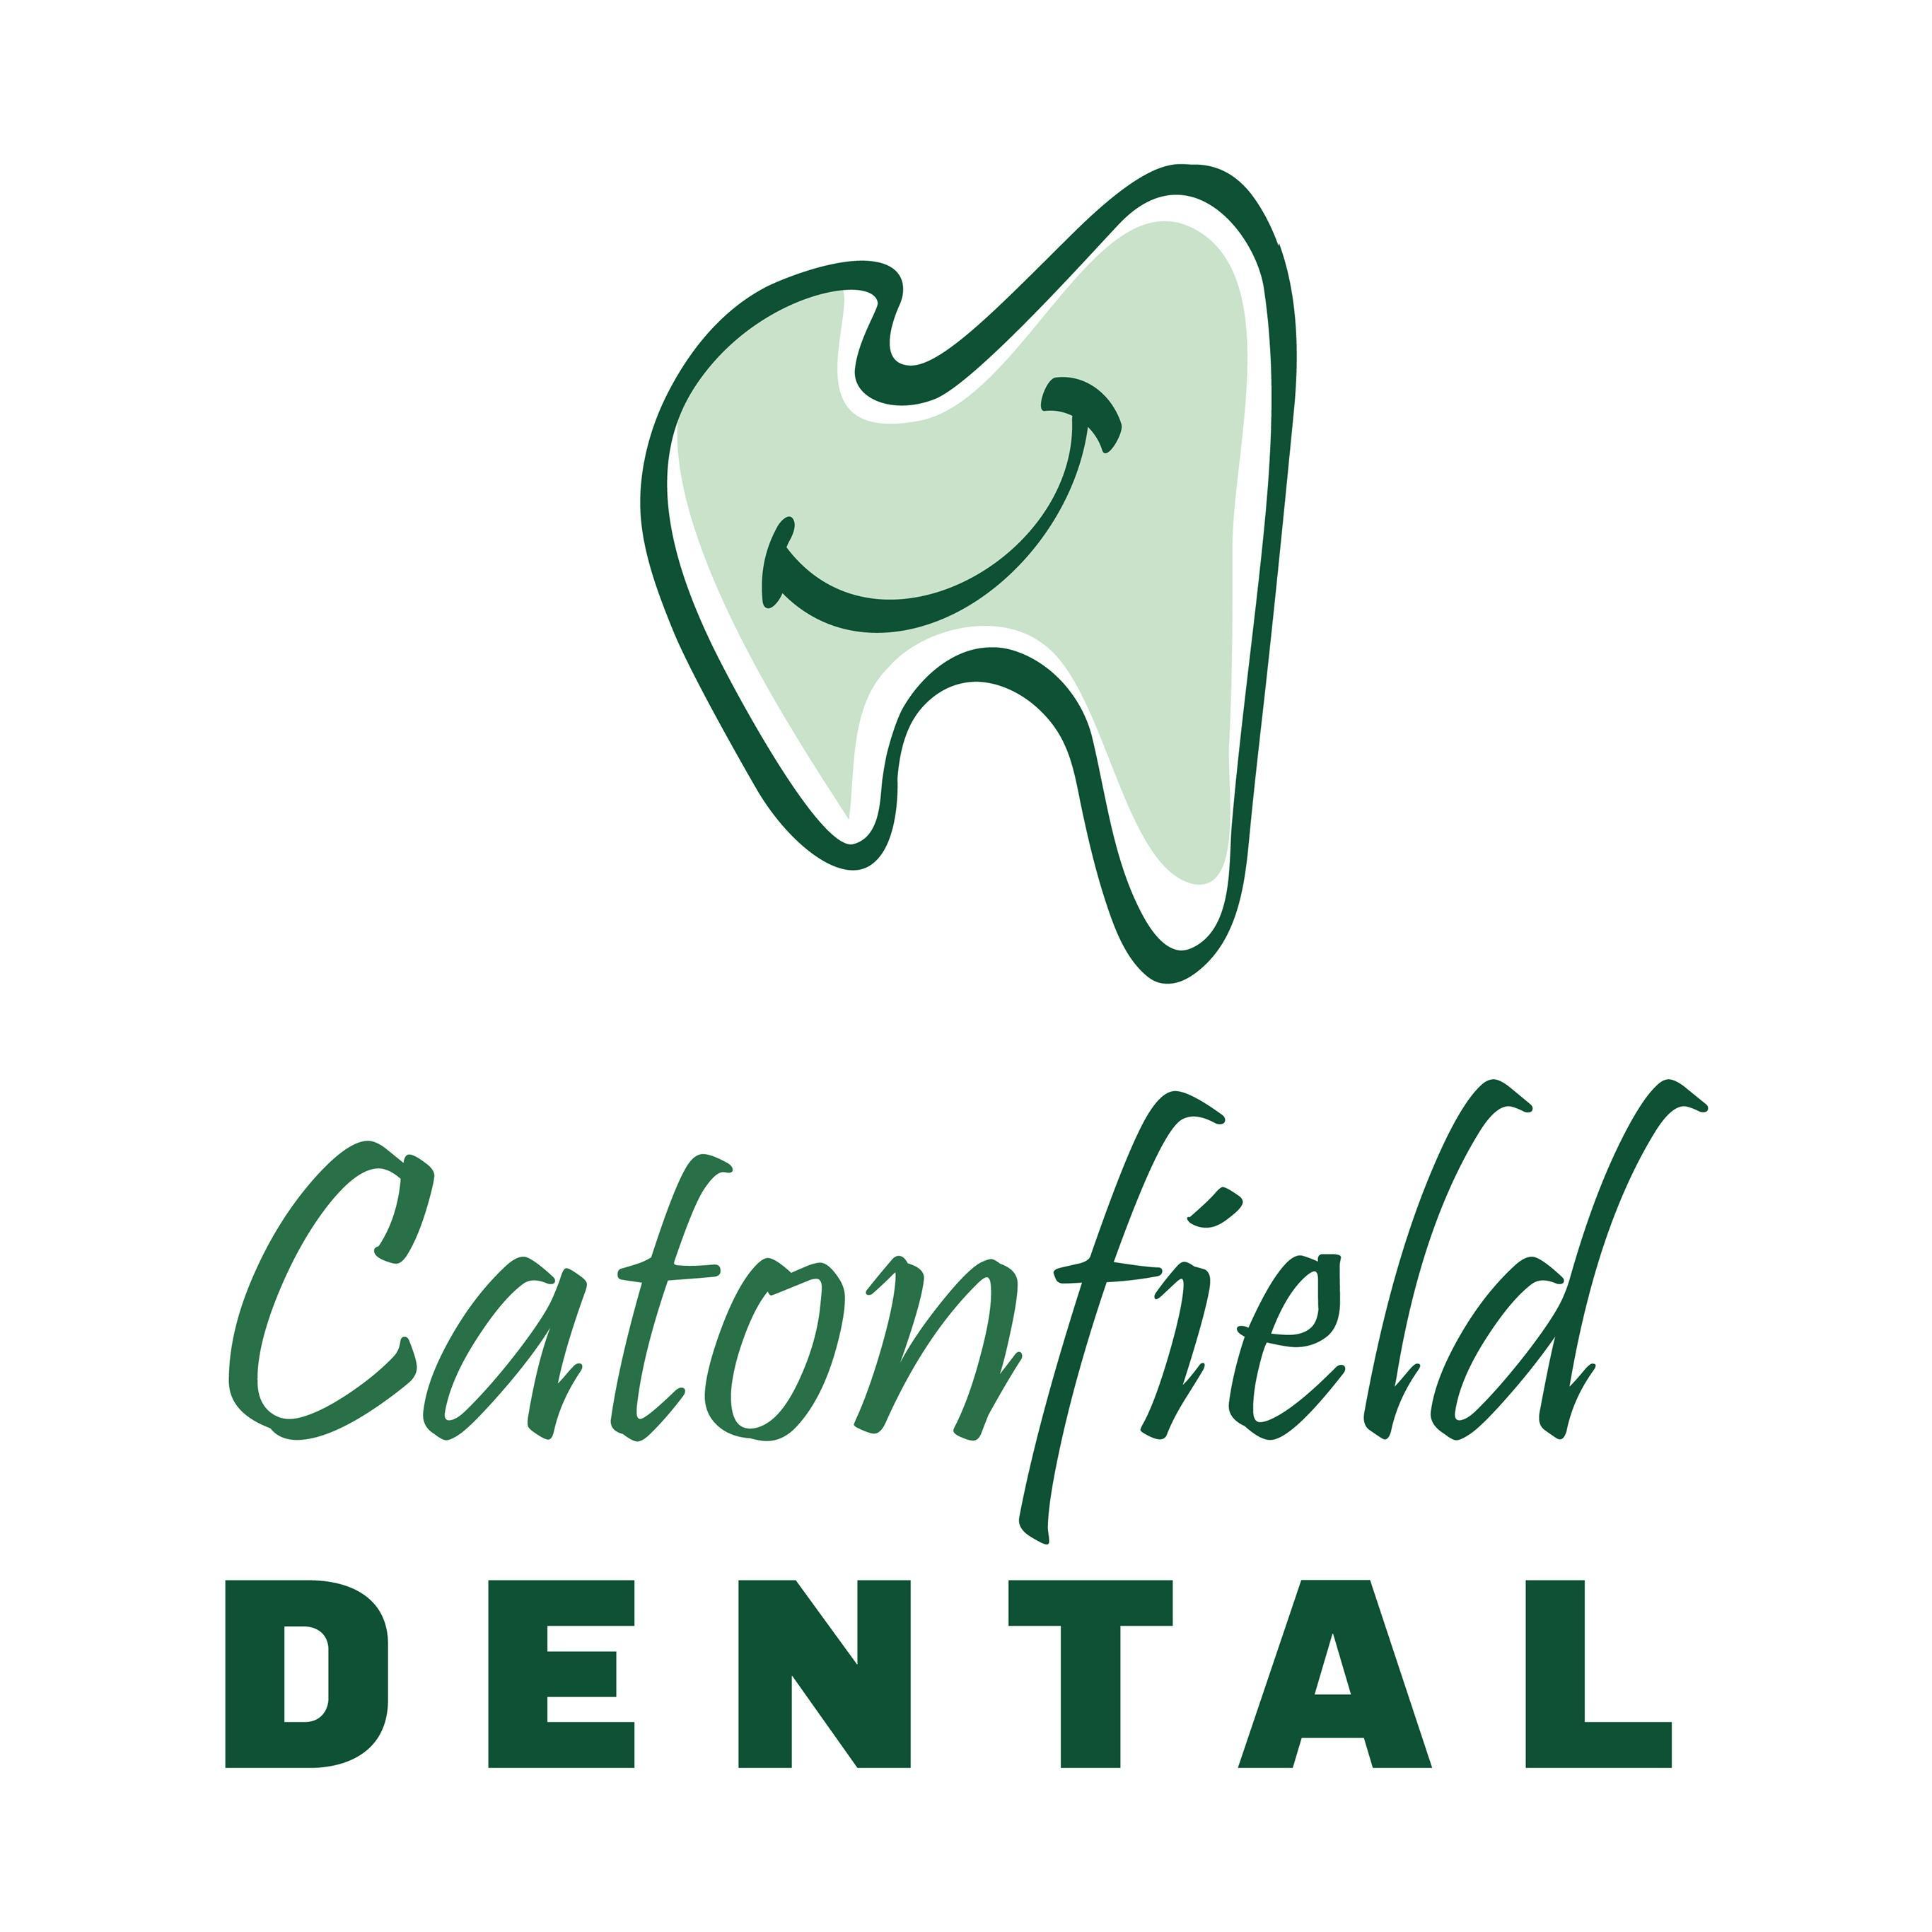 Catonfield Dental